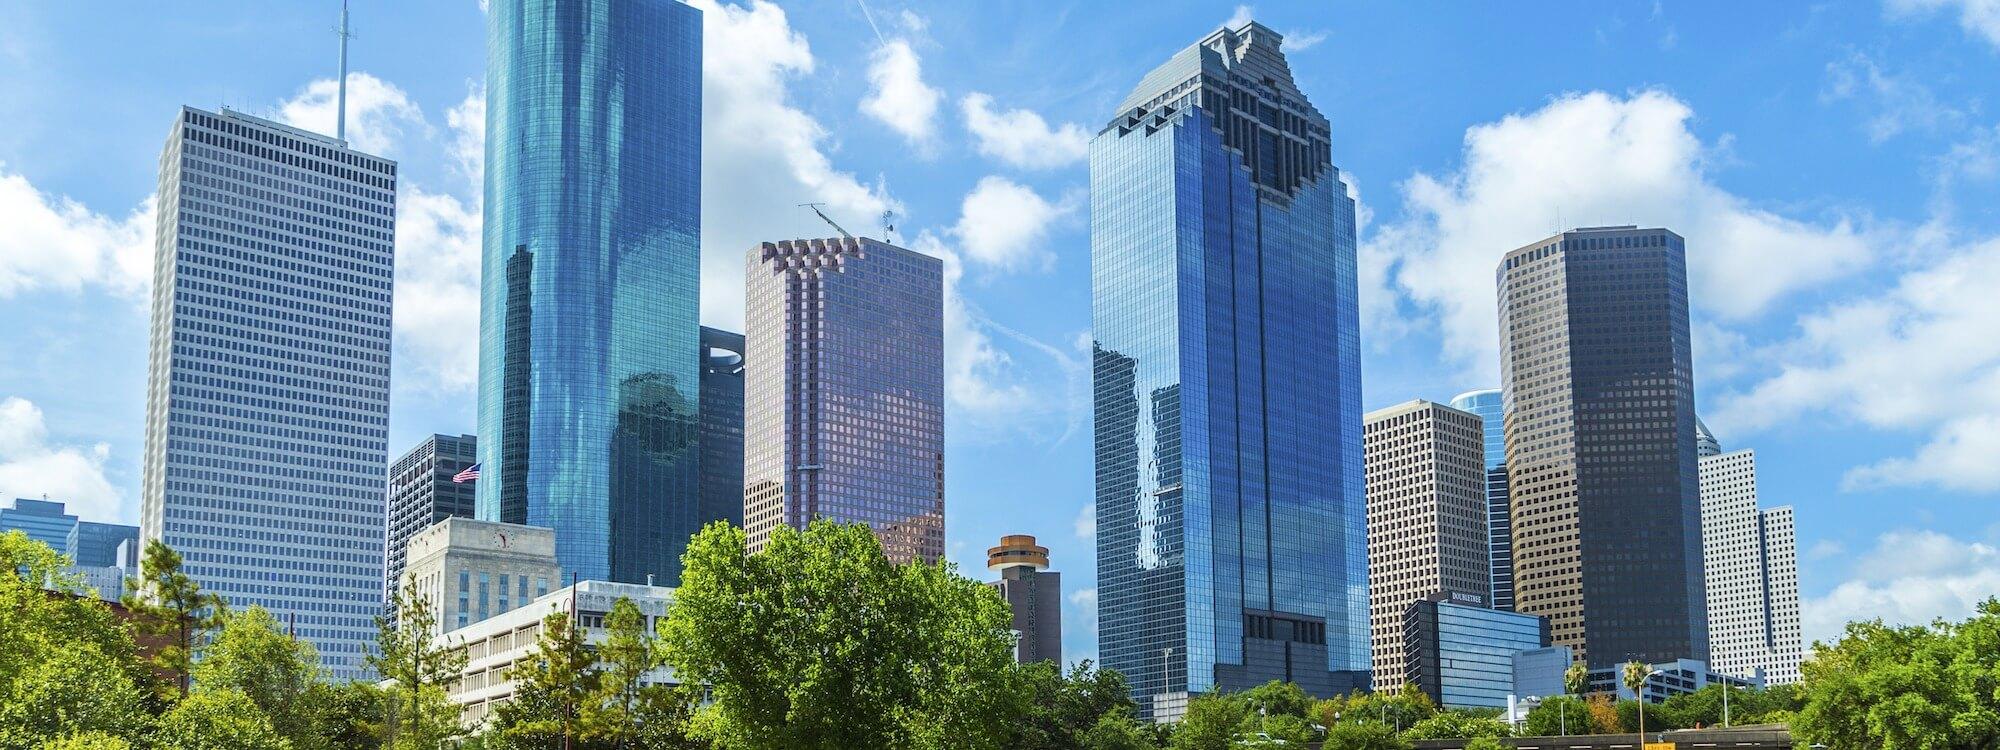 Commercial Property Appraisal Houston Texas Bbg